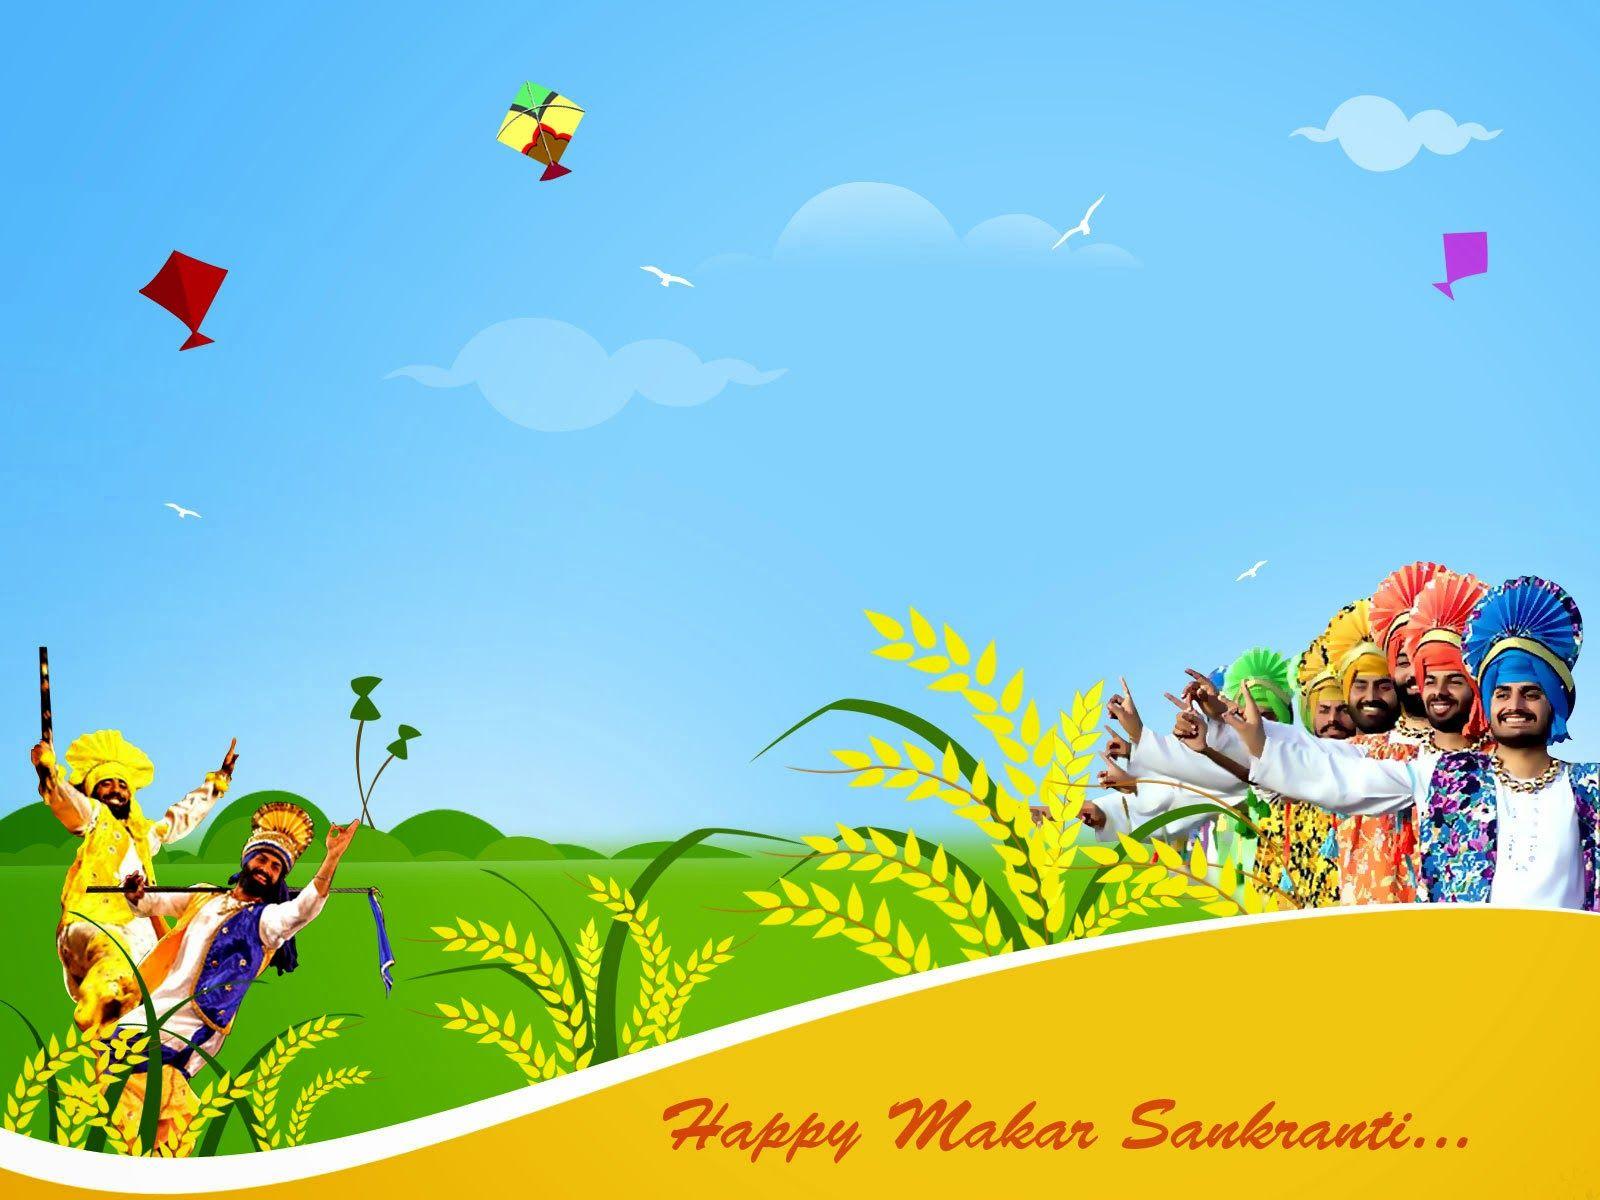 Makar Sankranti Wishes Picture Wallpaper Makar Sankranti Wishes In